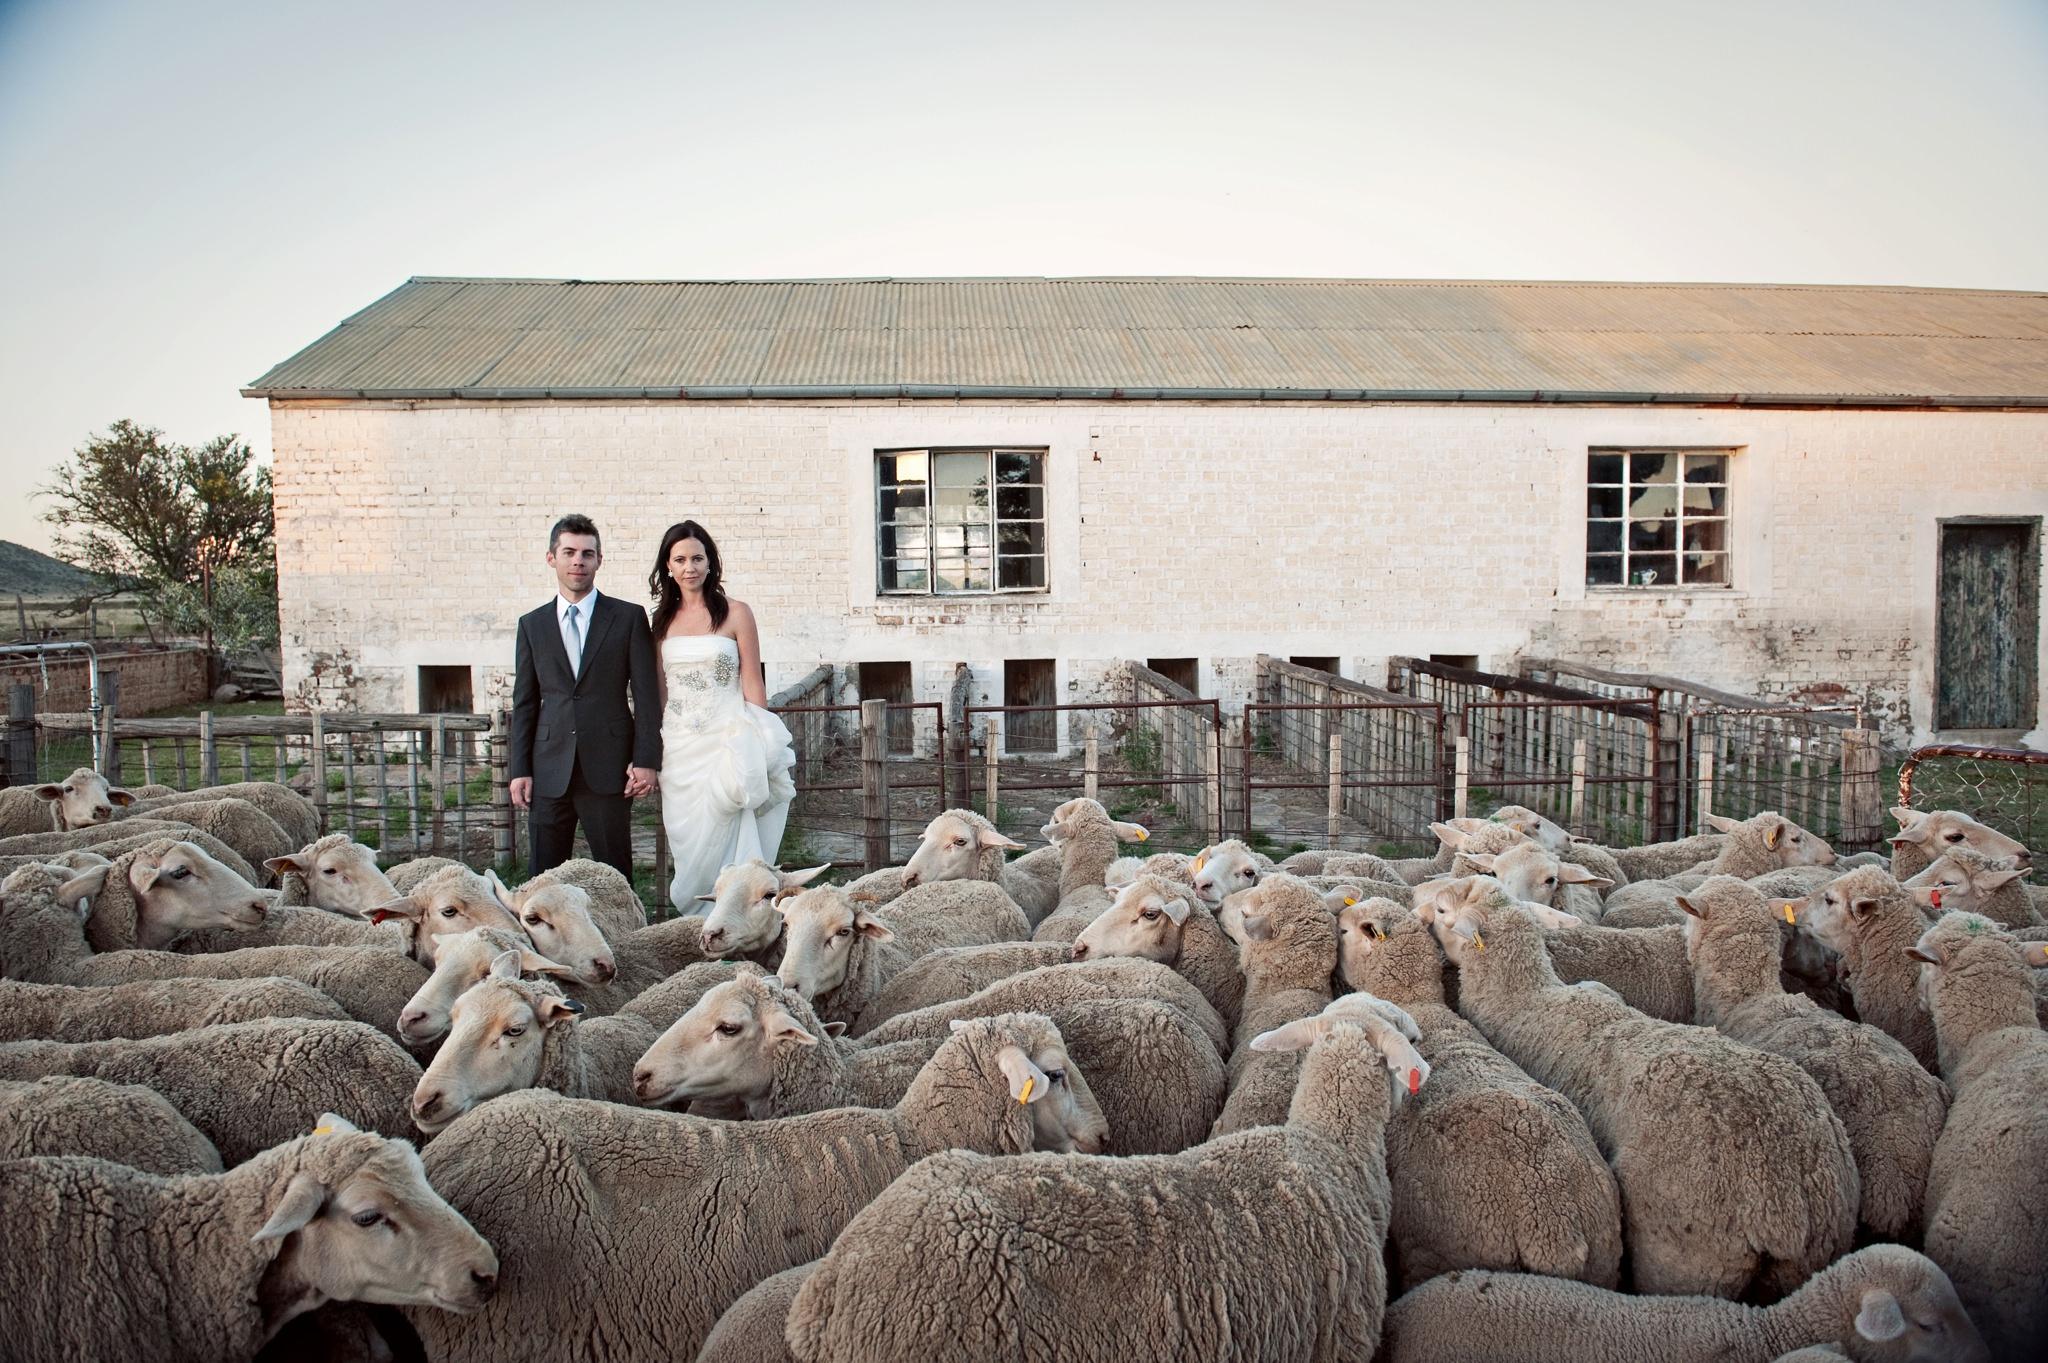 Testimonials-Top-South-African-Wedding-Photographer-Jacki-Bruniquel-020-001